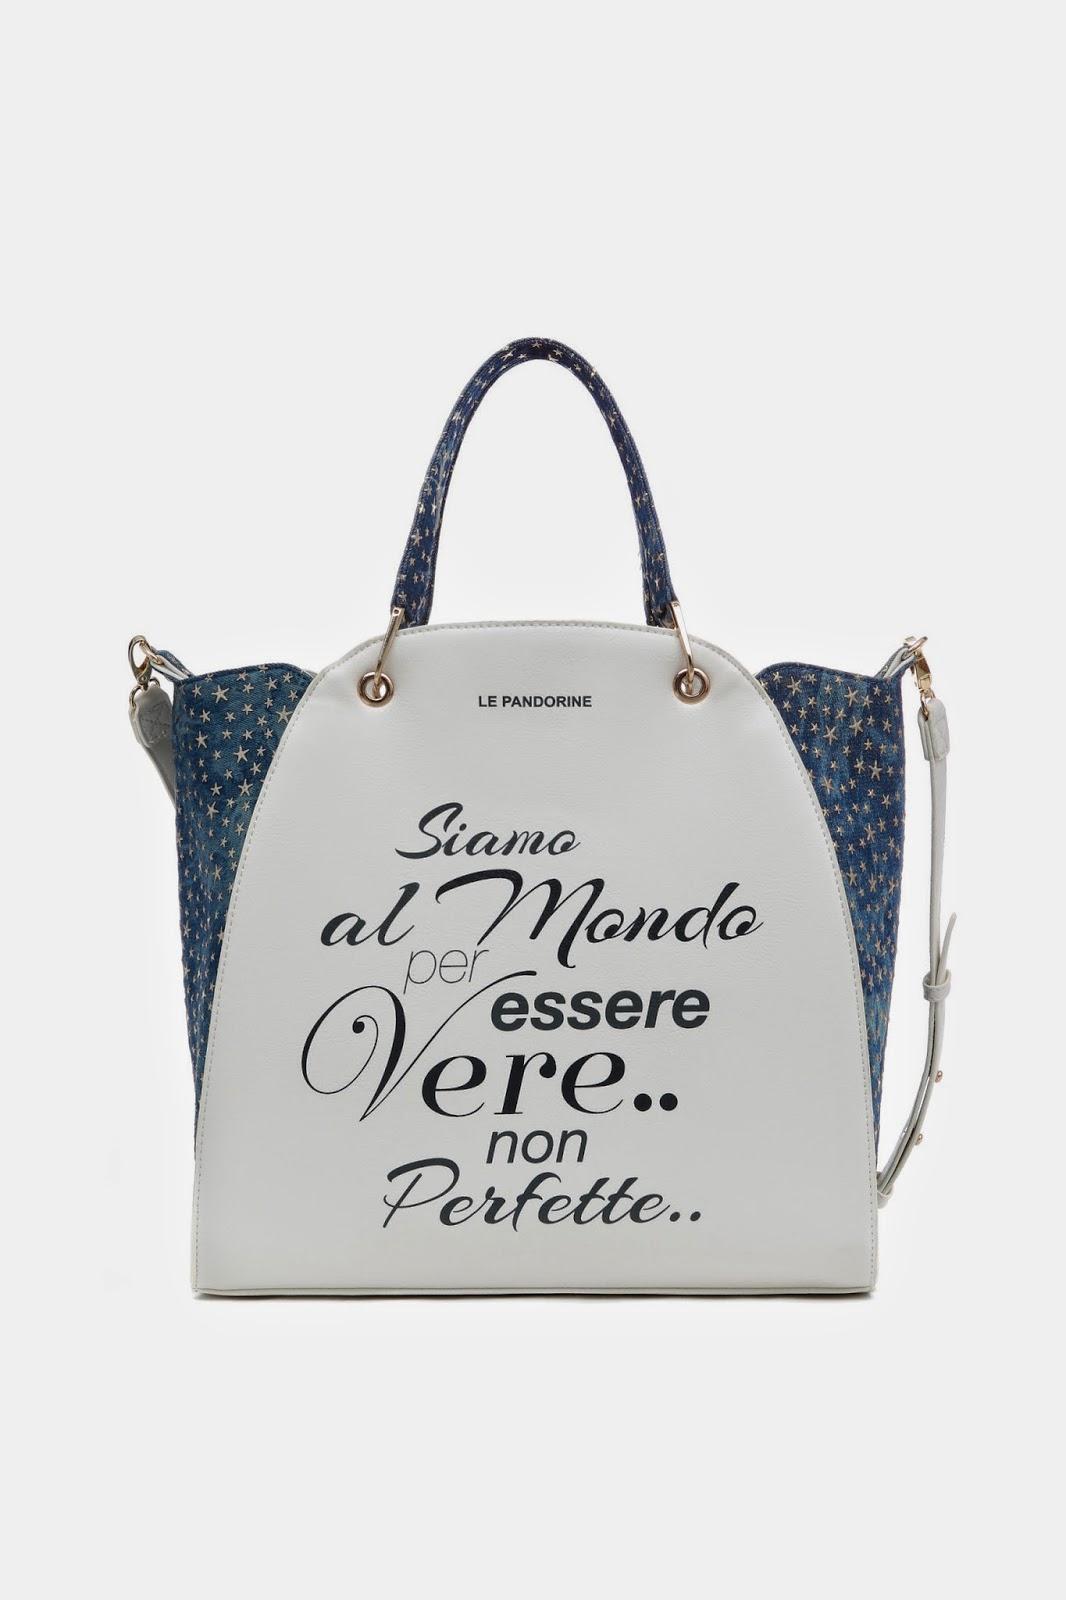 diyblog, diyblogger, fashion, fashionblog, fashionblogger, bag, borse, lepandorine, summer, themorasmoothie, denim, madeinitaly, S/S2014